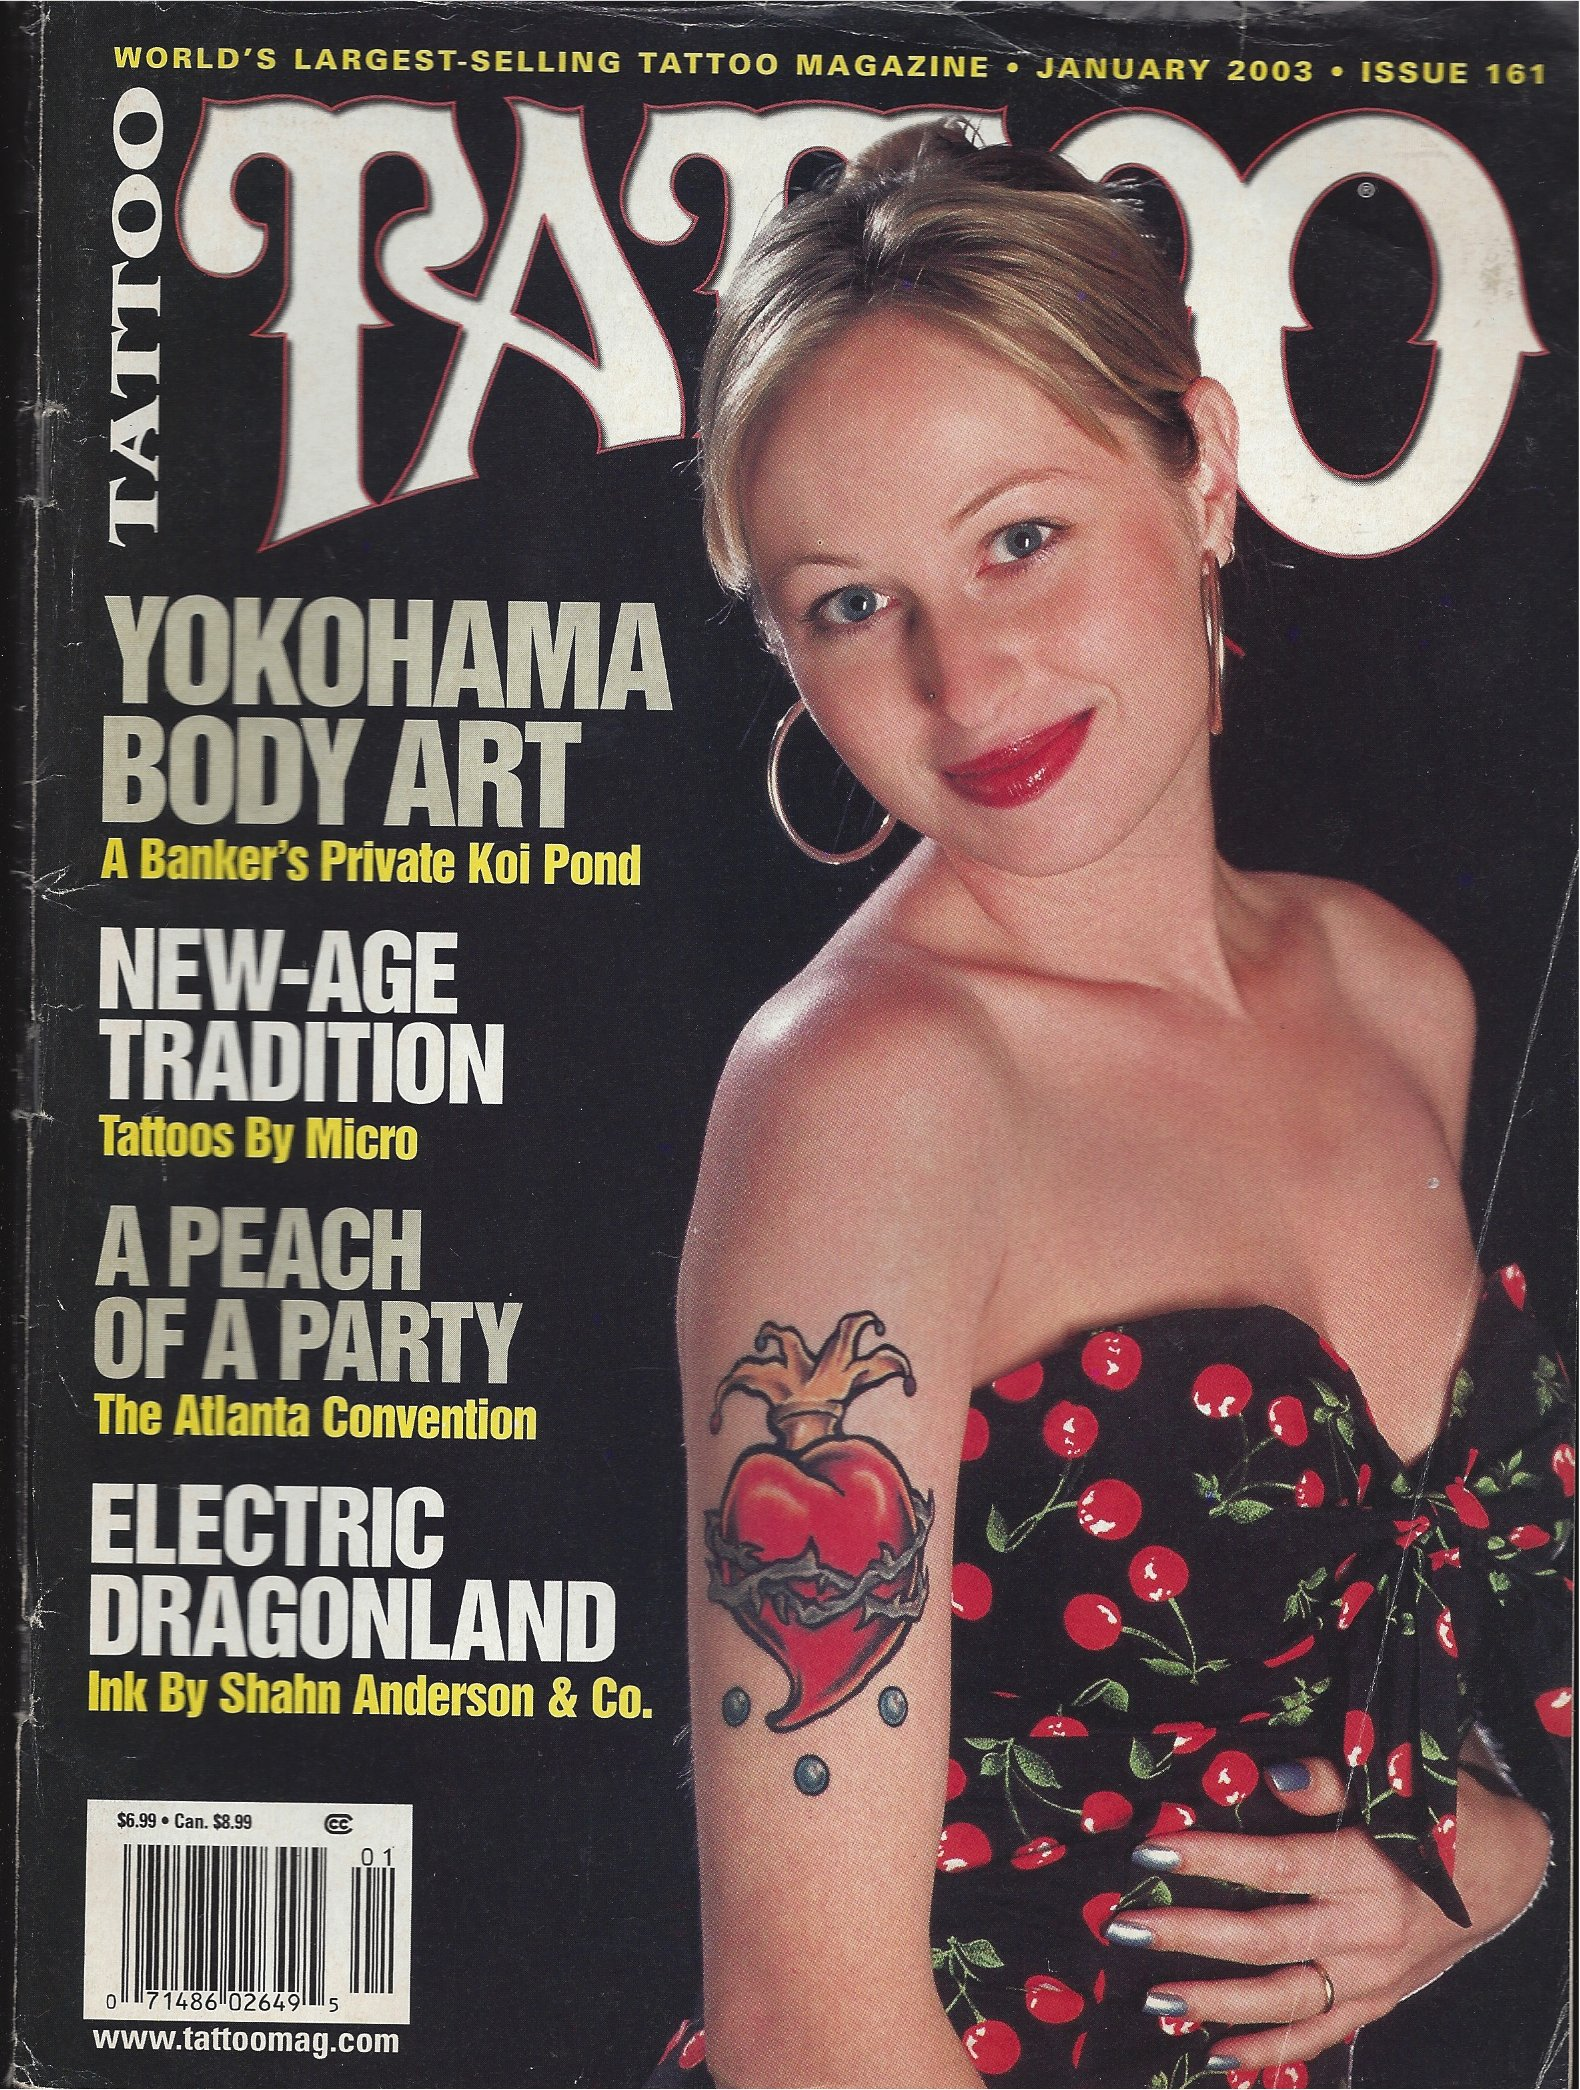 TATTOO Magazine January 2003 No. 161 (World's largest selling tattoo magazine, Yokohama body art, Tattoos by Micro, Electric Dragonland, Ink by Shahn Anderson)